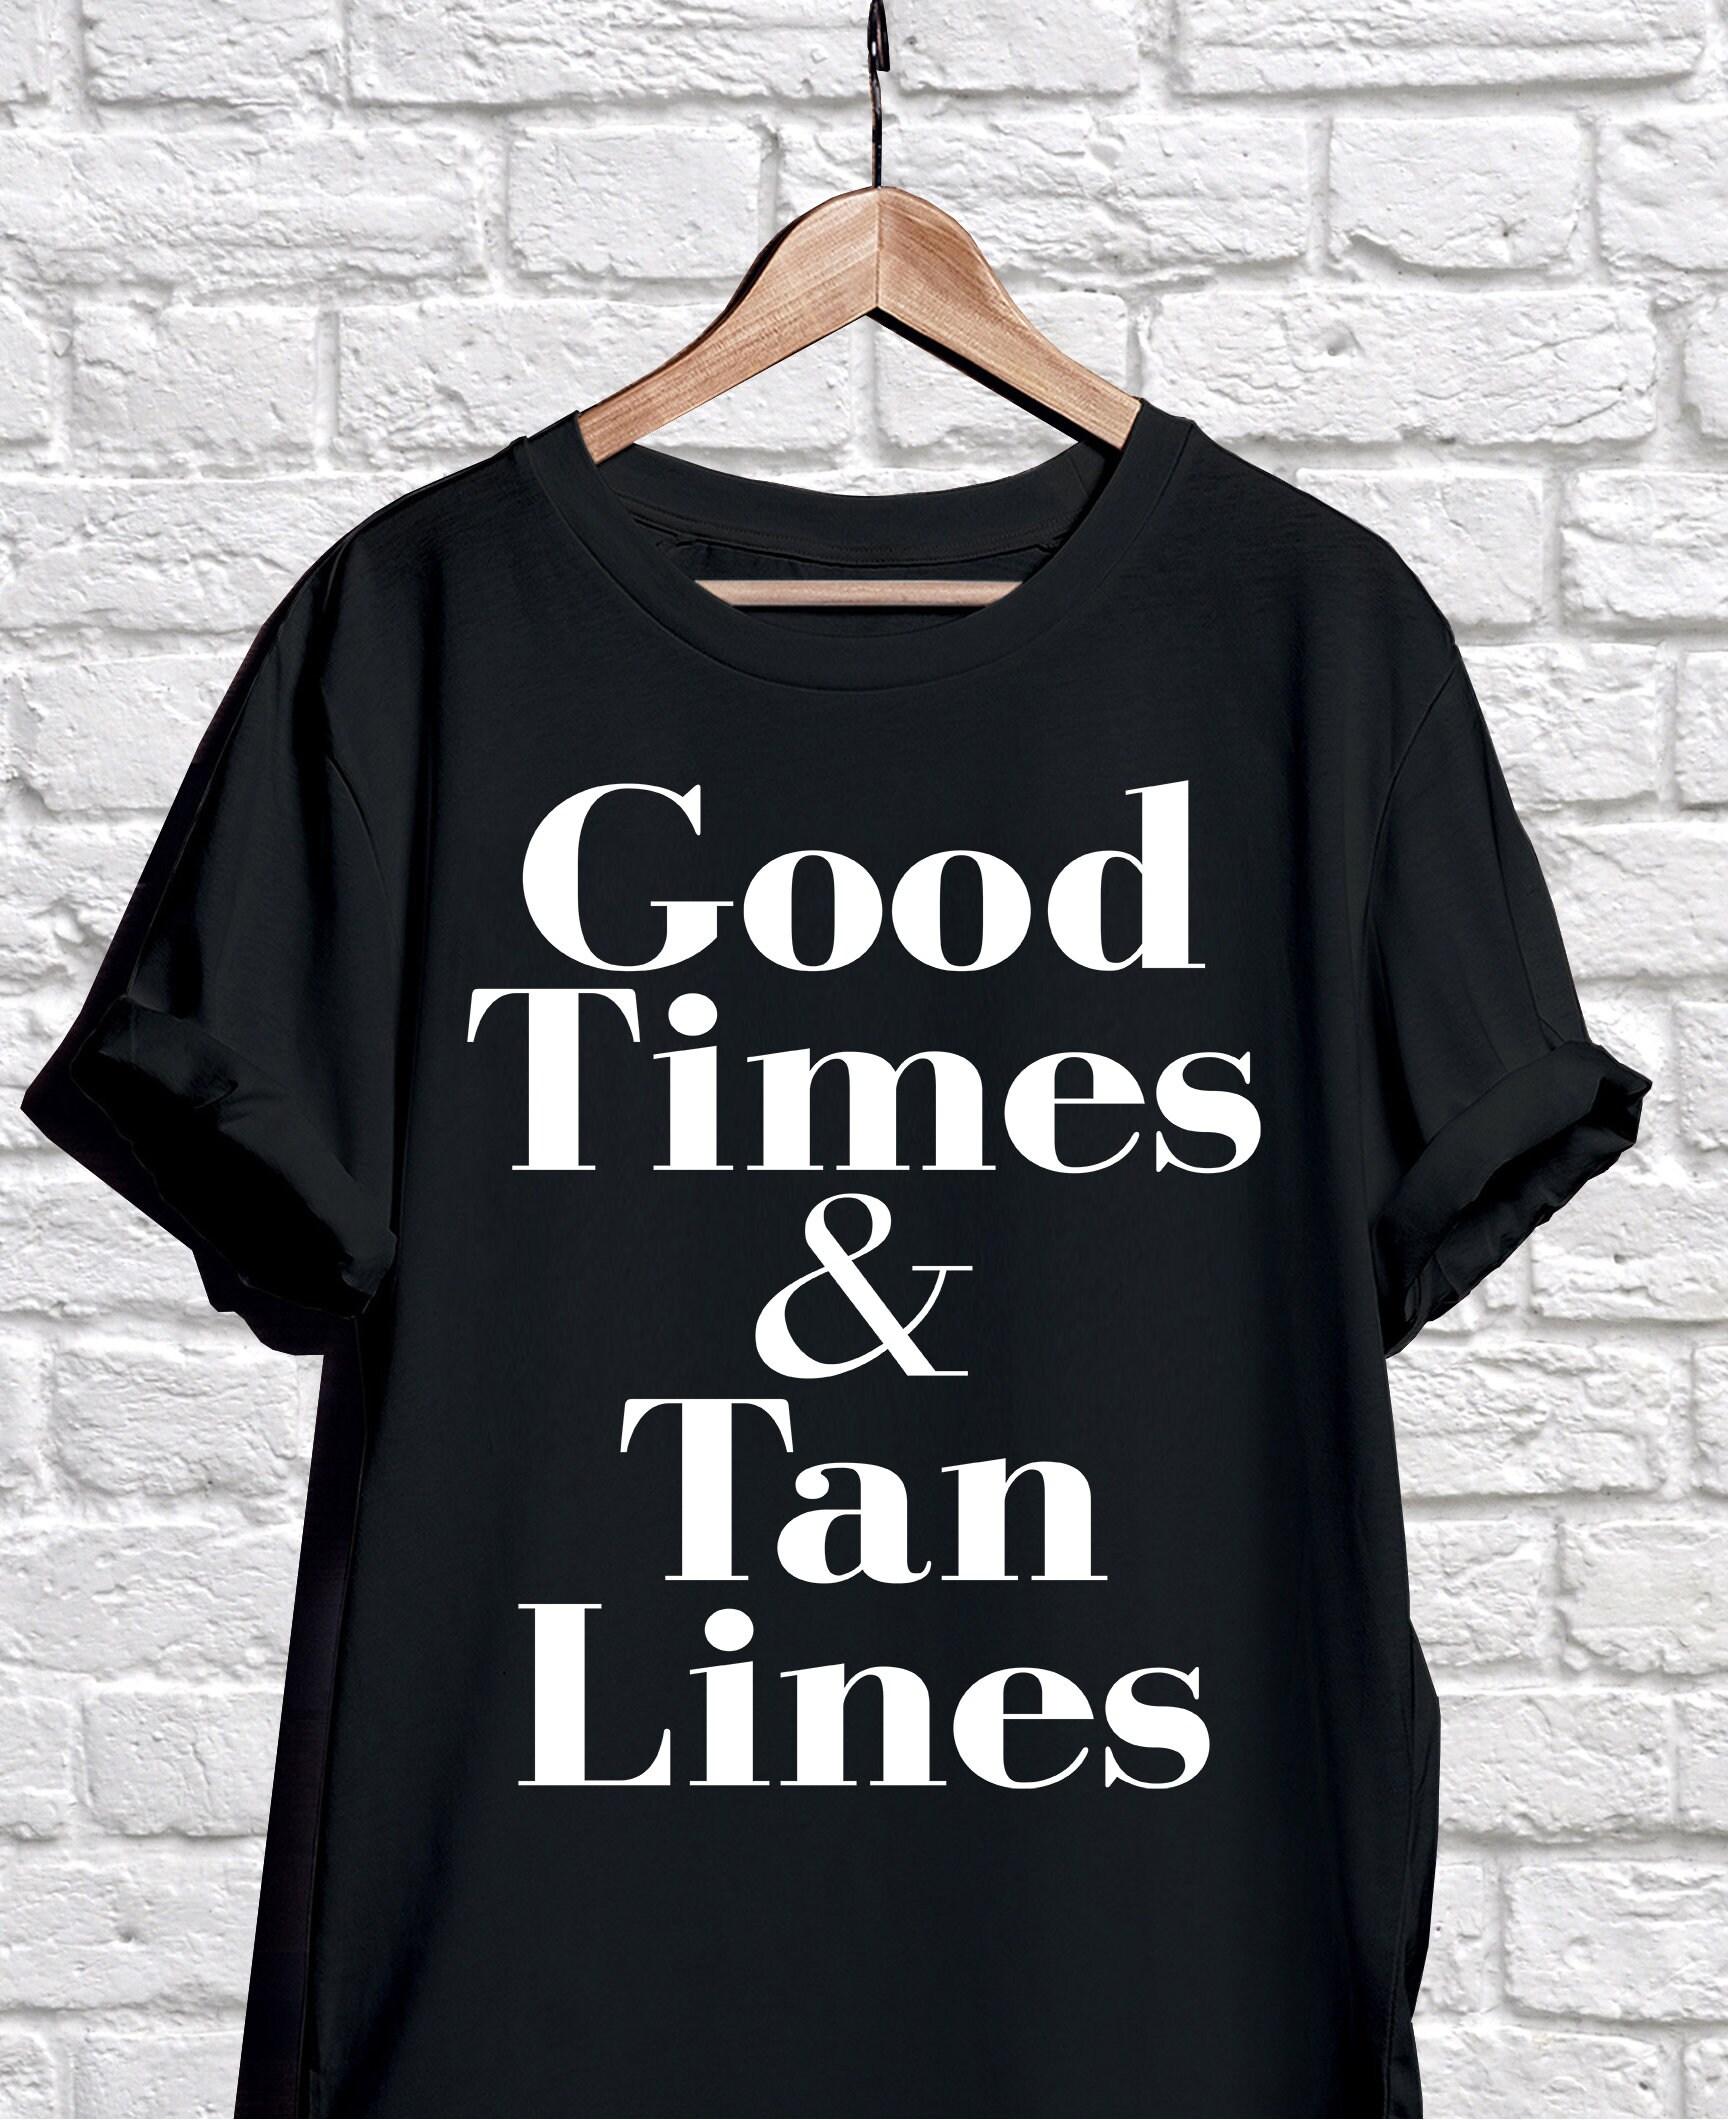 01c0eea3 Good Times & Tan Lines T-Shirt Ladies Unisex Beach T-shirt